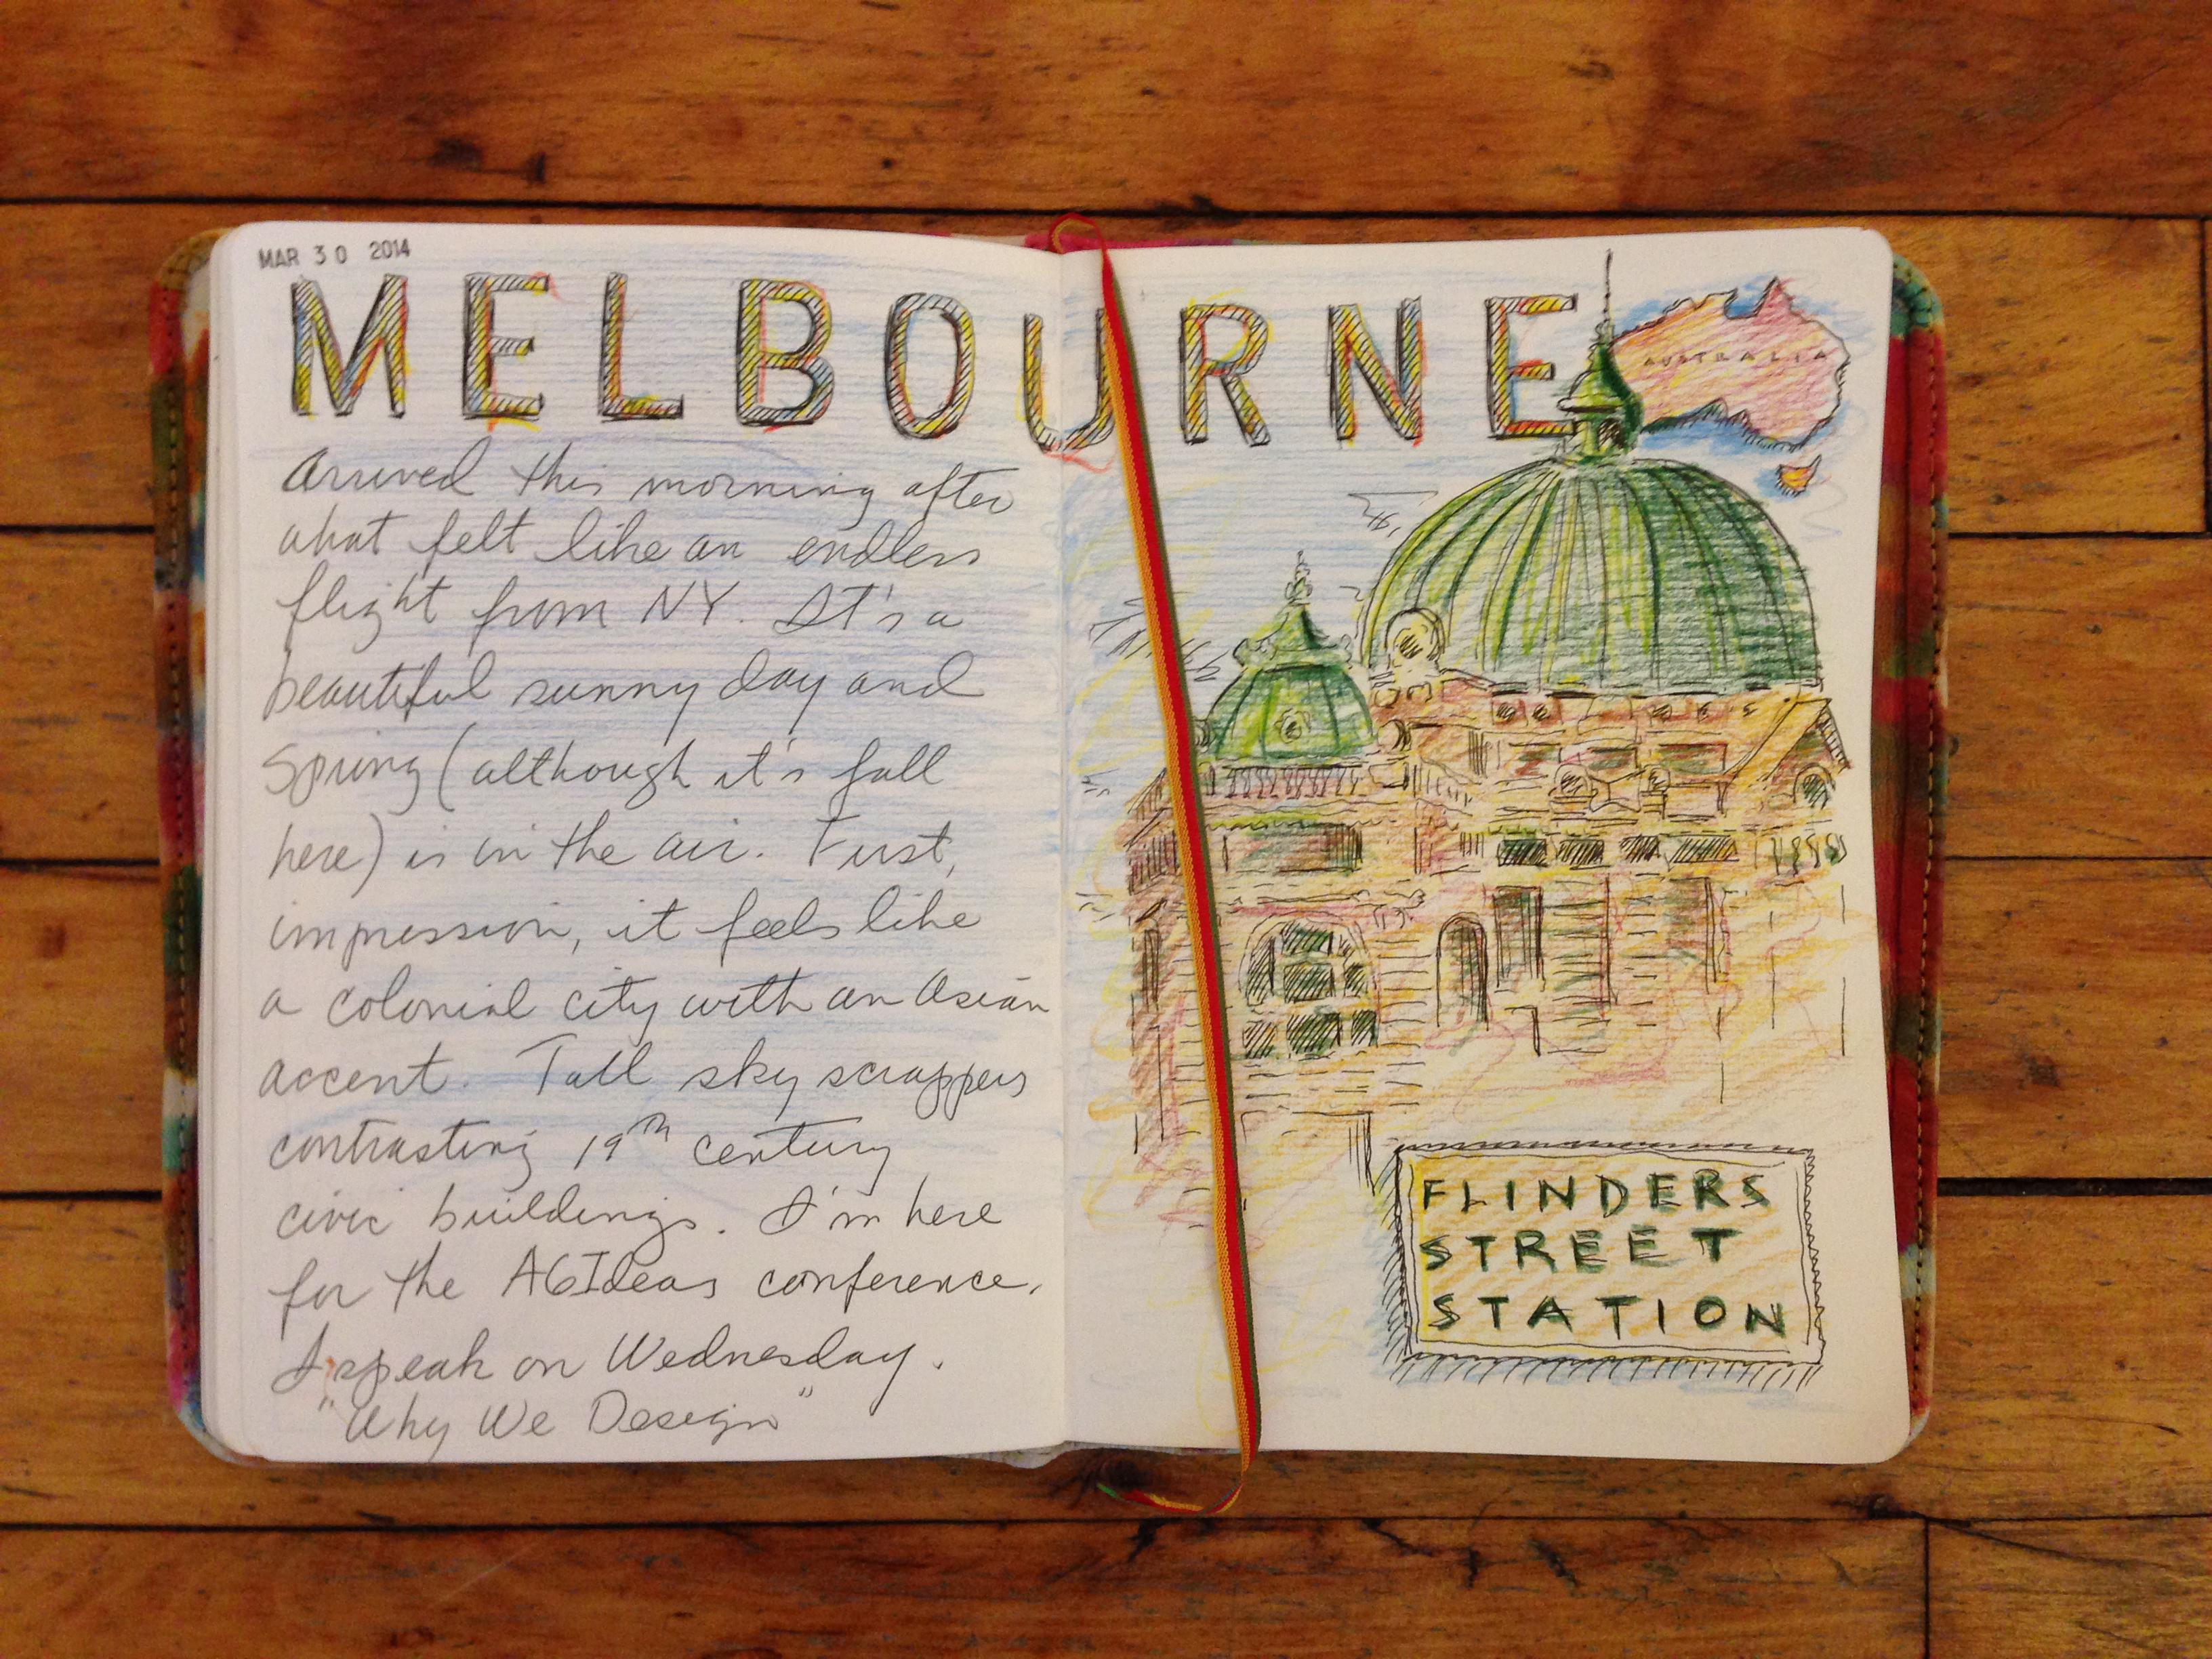 Creative Diary Entries creative writing journal entries essay help you ...